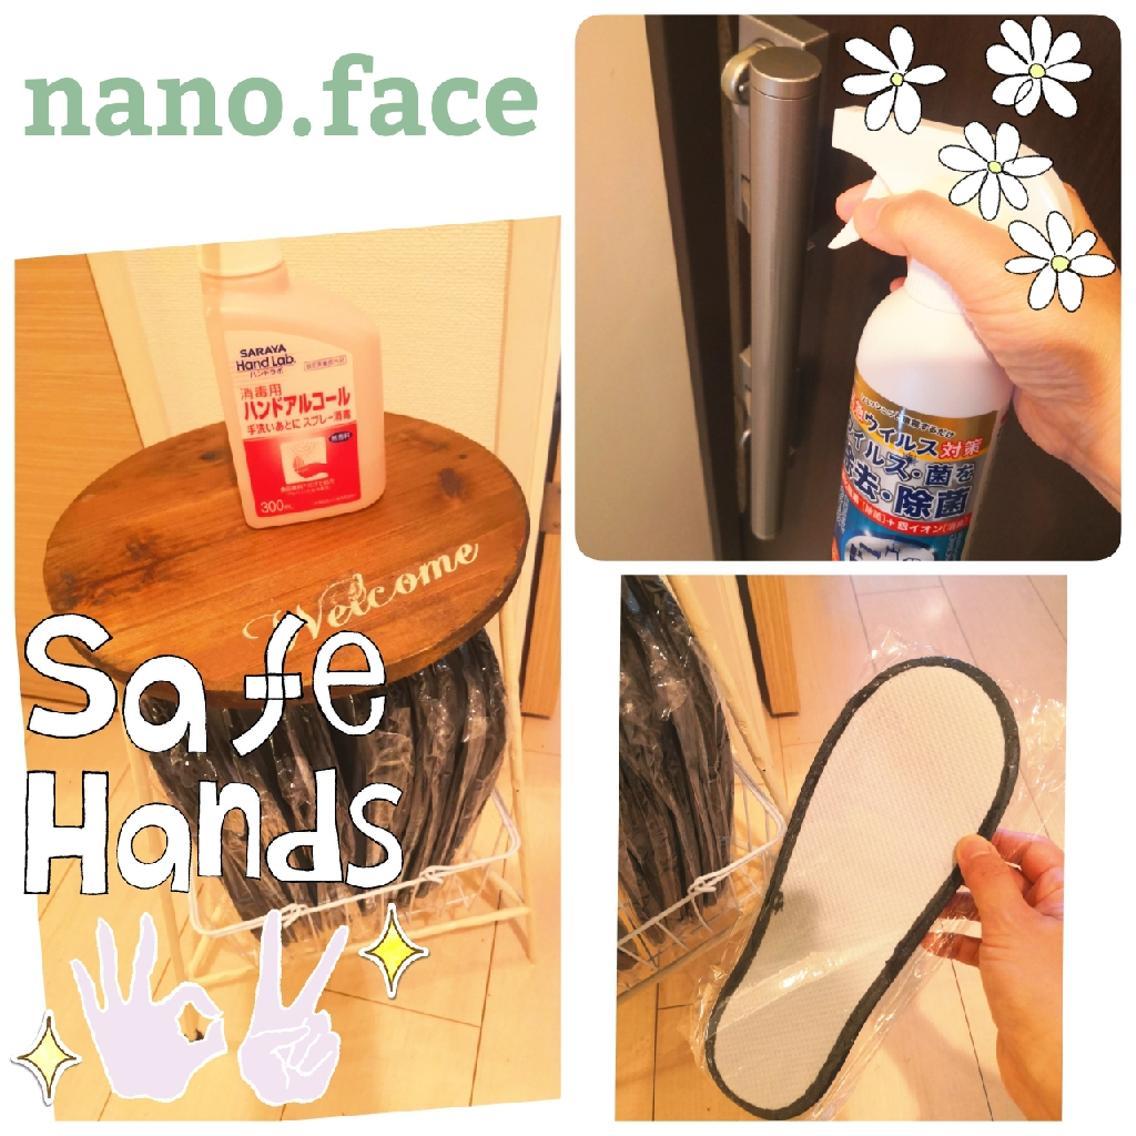 nano.face渋谷店所属・nano.face  渋谷店の掲載